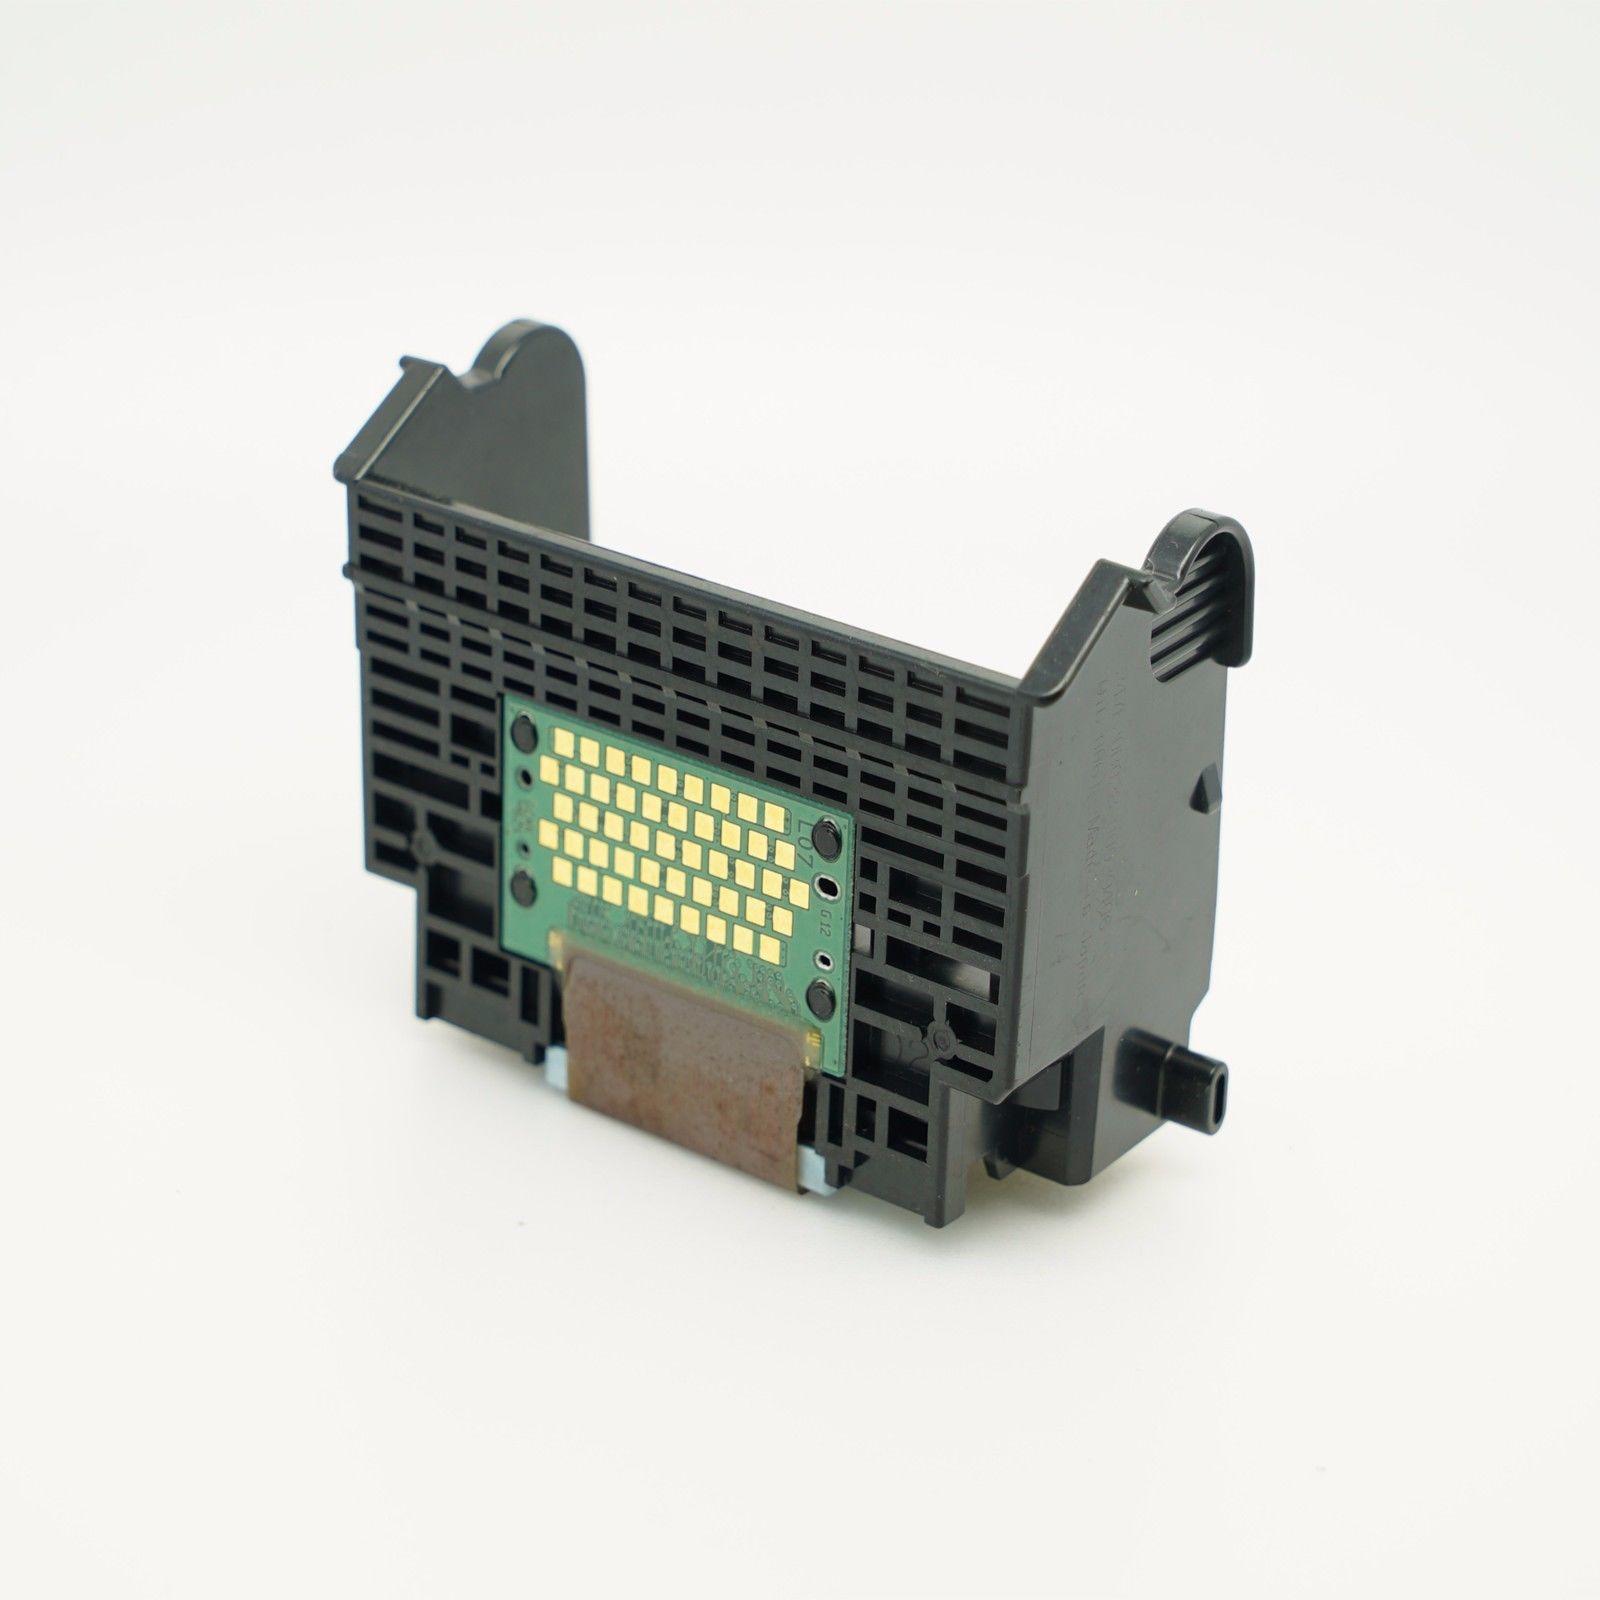 QY6-0061 Print Head for Canon IP4300 IP5200 IP5200R MP600 MP600R MP800 MP830 Printhead new original print head qy6 0061 printhead compatible for canon ip4300 ip5200 mp600 mp600r mp800 mp800r mp830